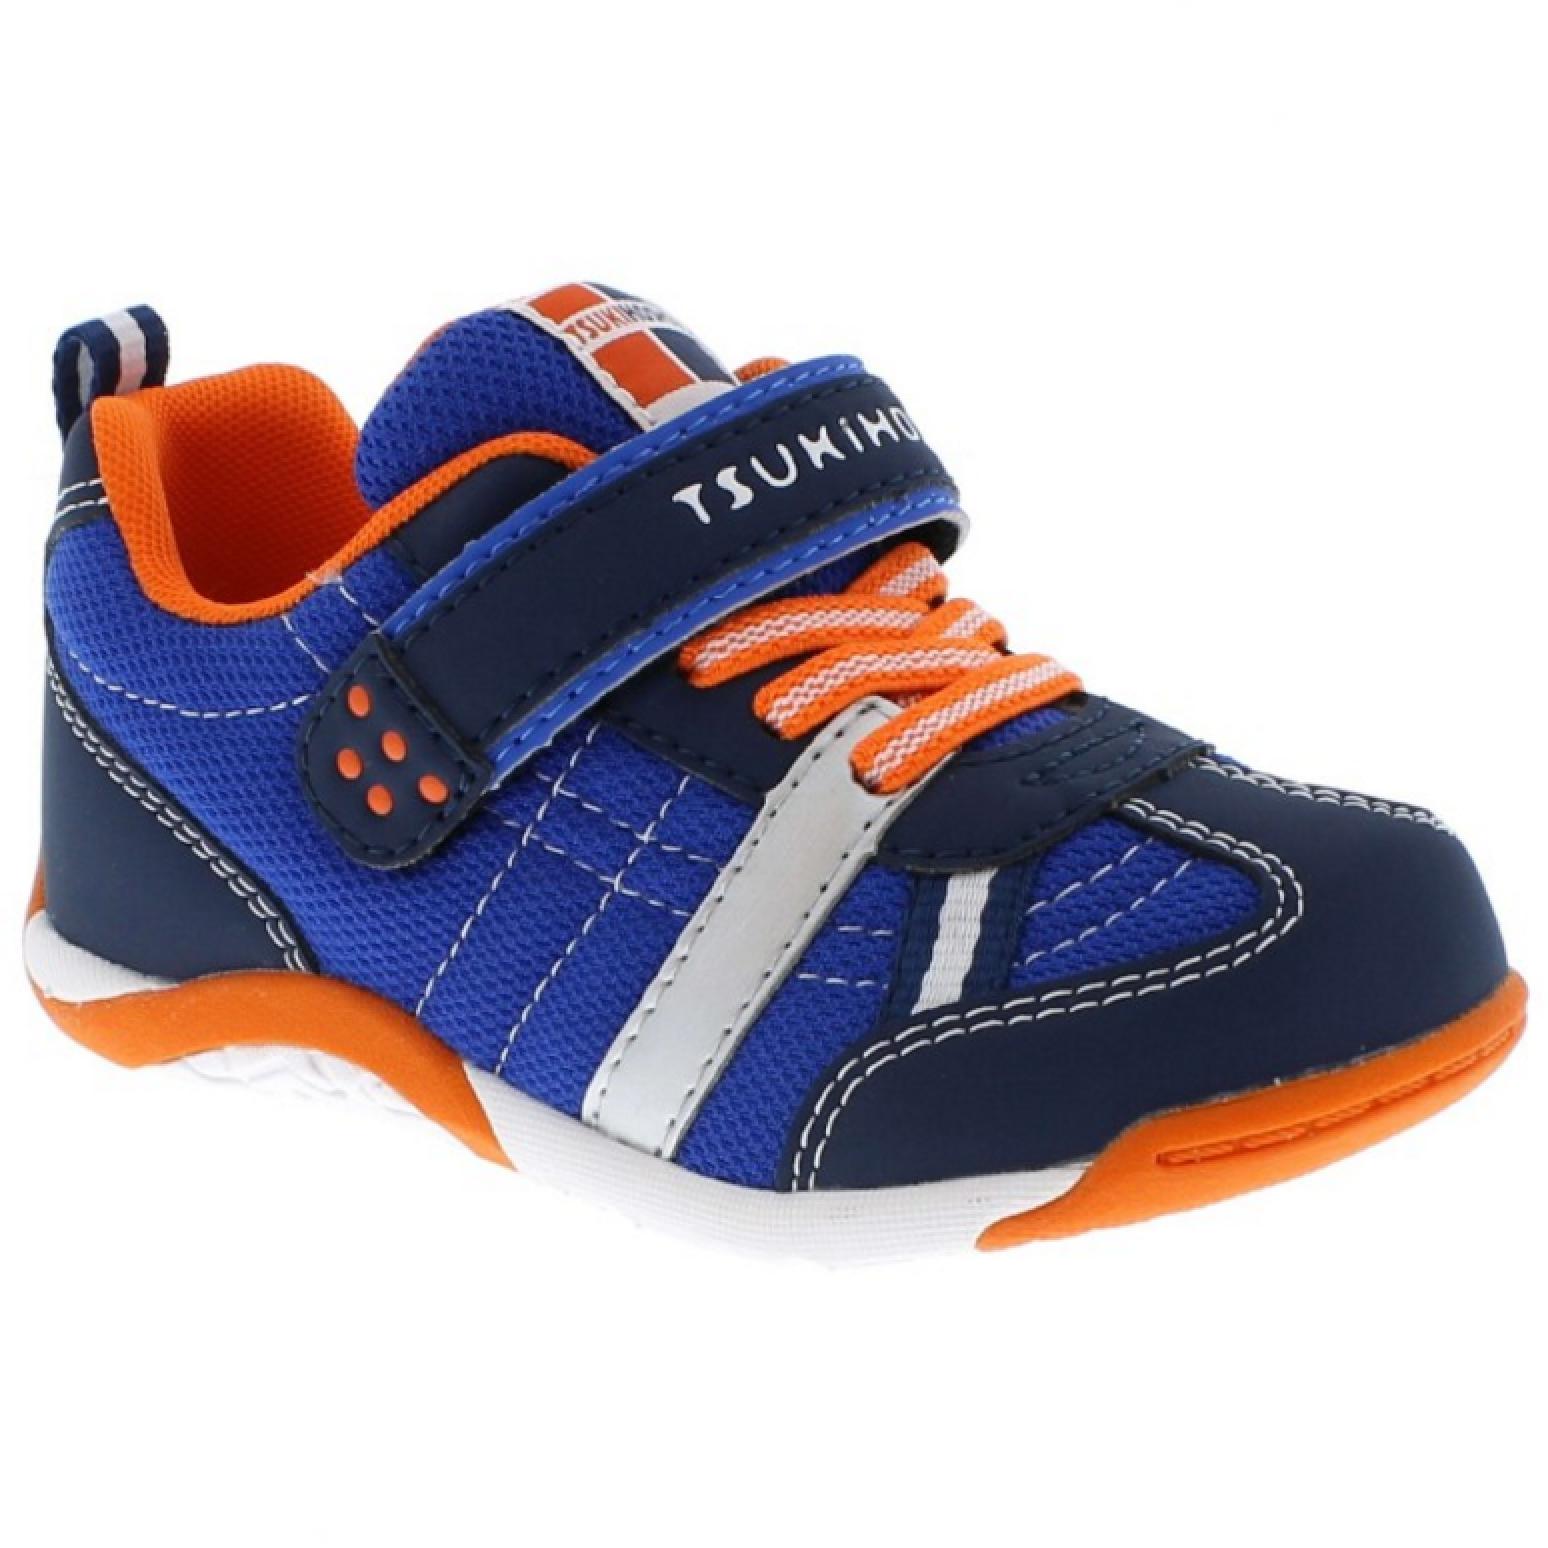 Tsukihoshi Kid Kaz Navy/Orange | Laurie's Shoes